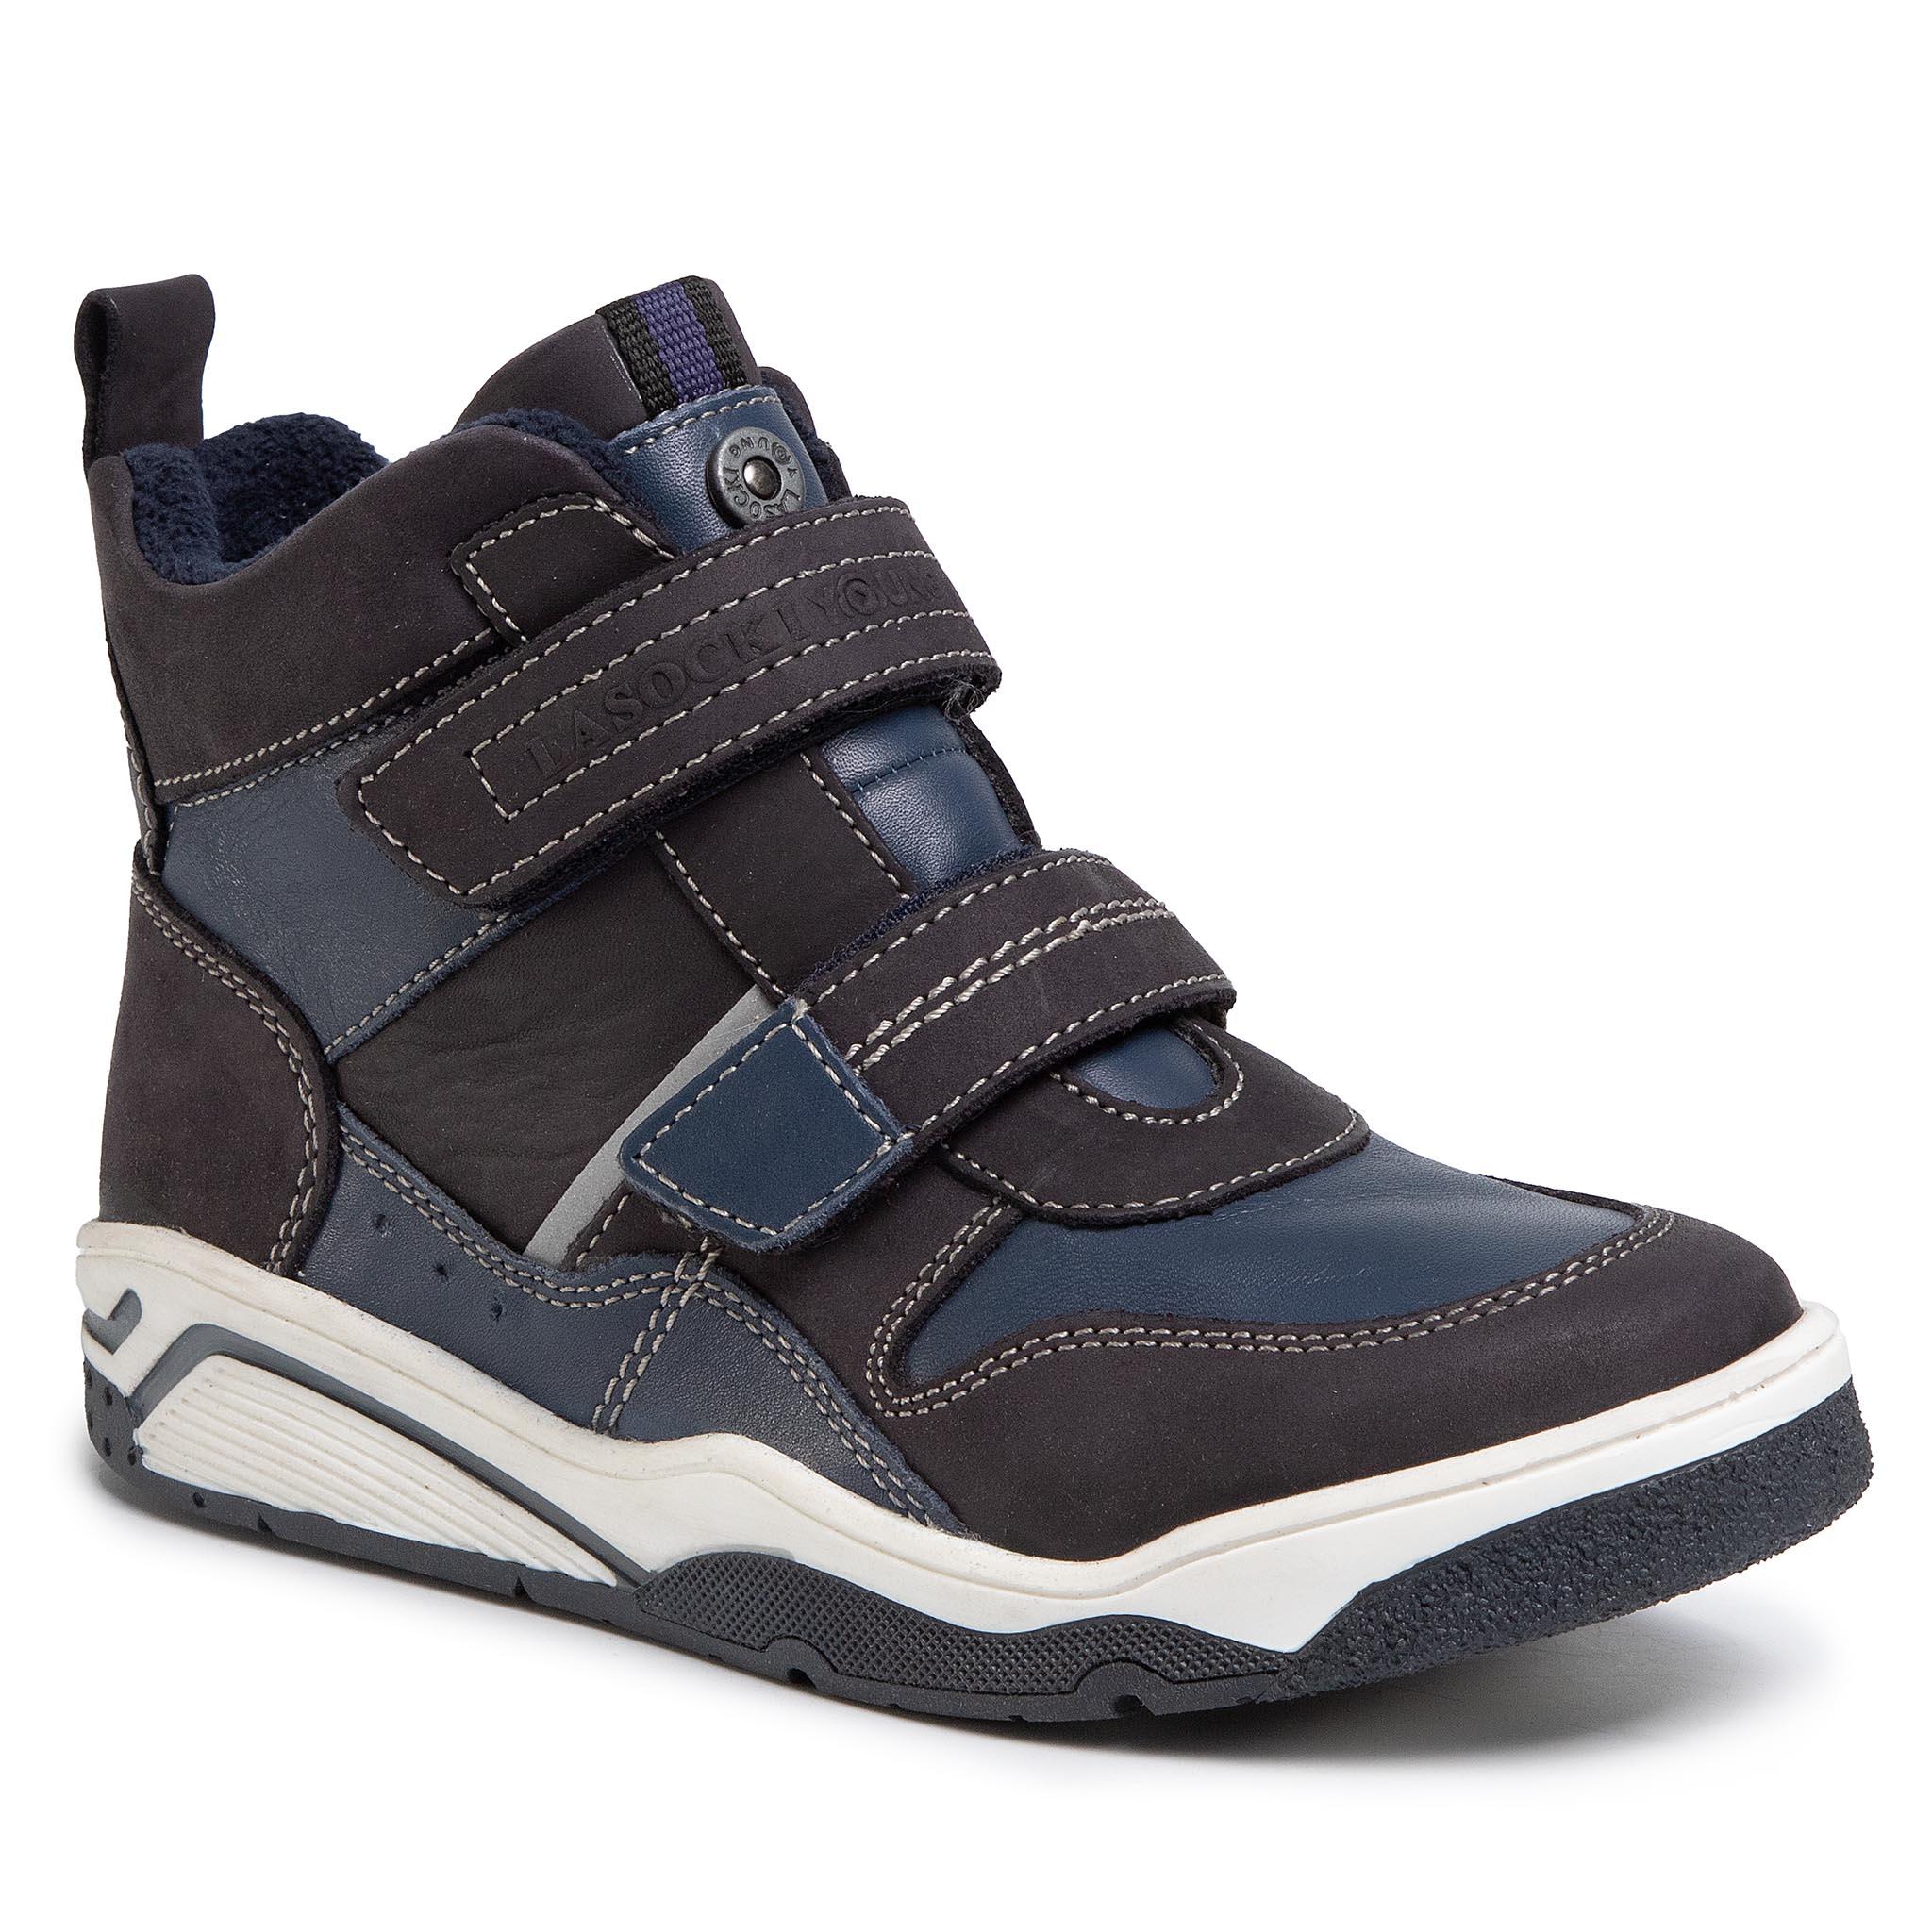 Outdoorová obuv LASOCKI YOUNG - CI12-2781-20 Cobalt Blue